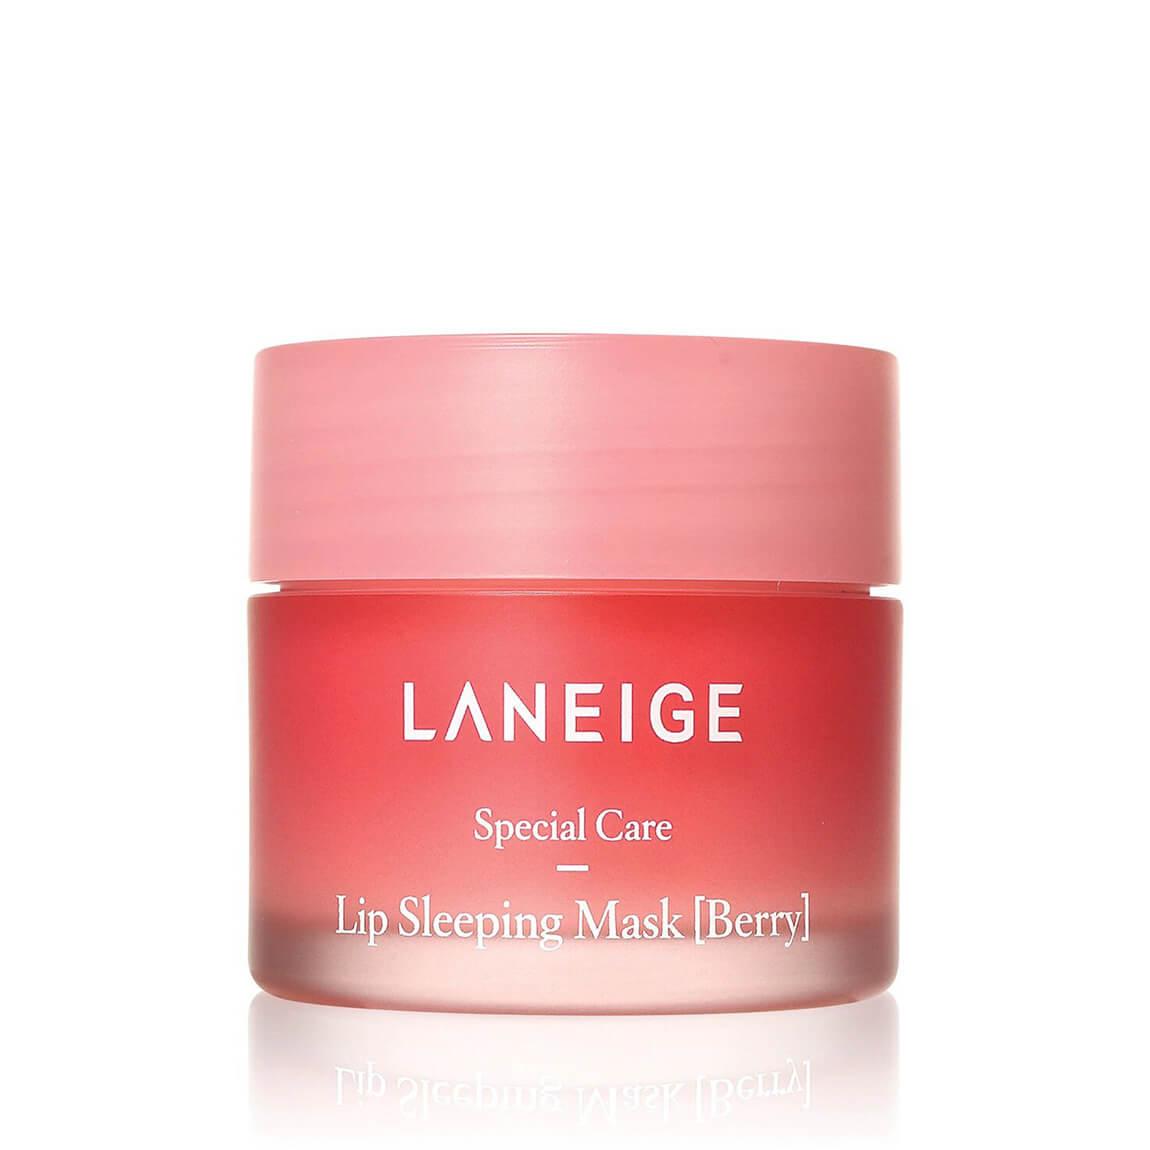 Laneige Lip Sleeping Leave-on Mask (Berry) 20ml